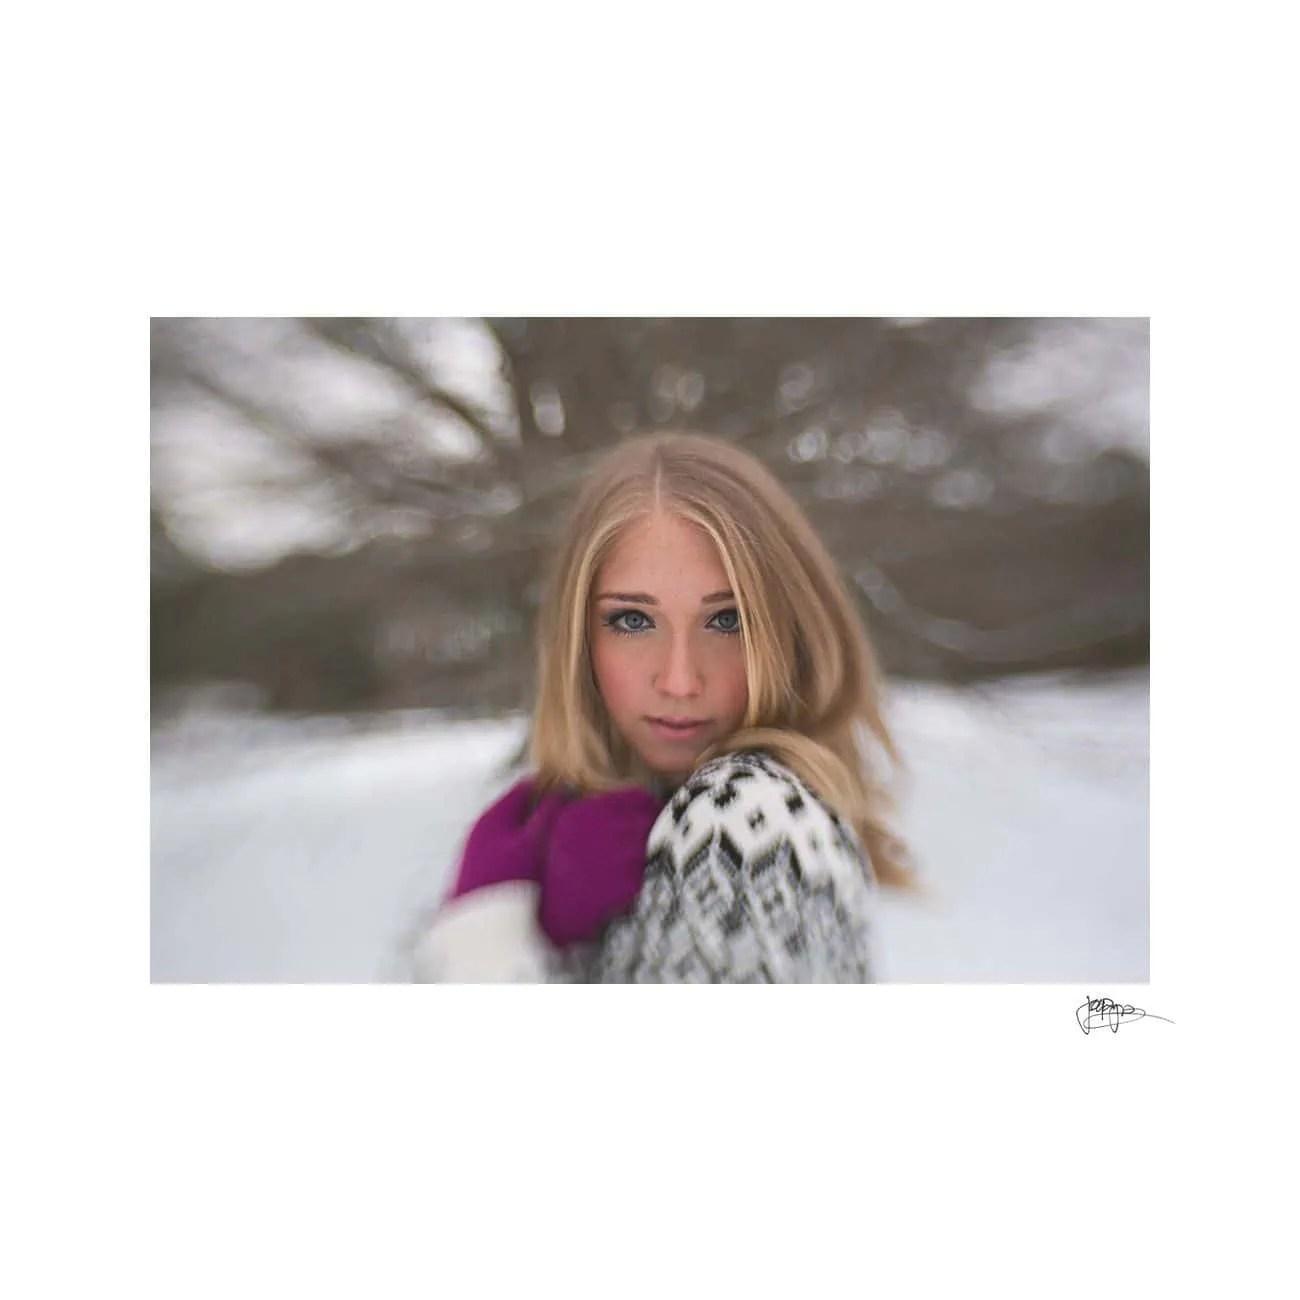 raleigh portrait photographer lensbaby